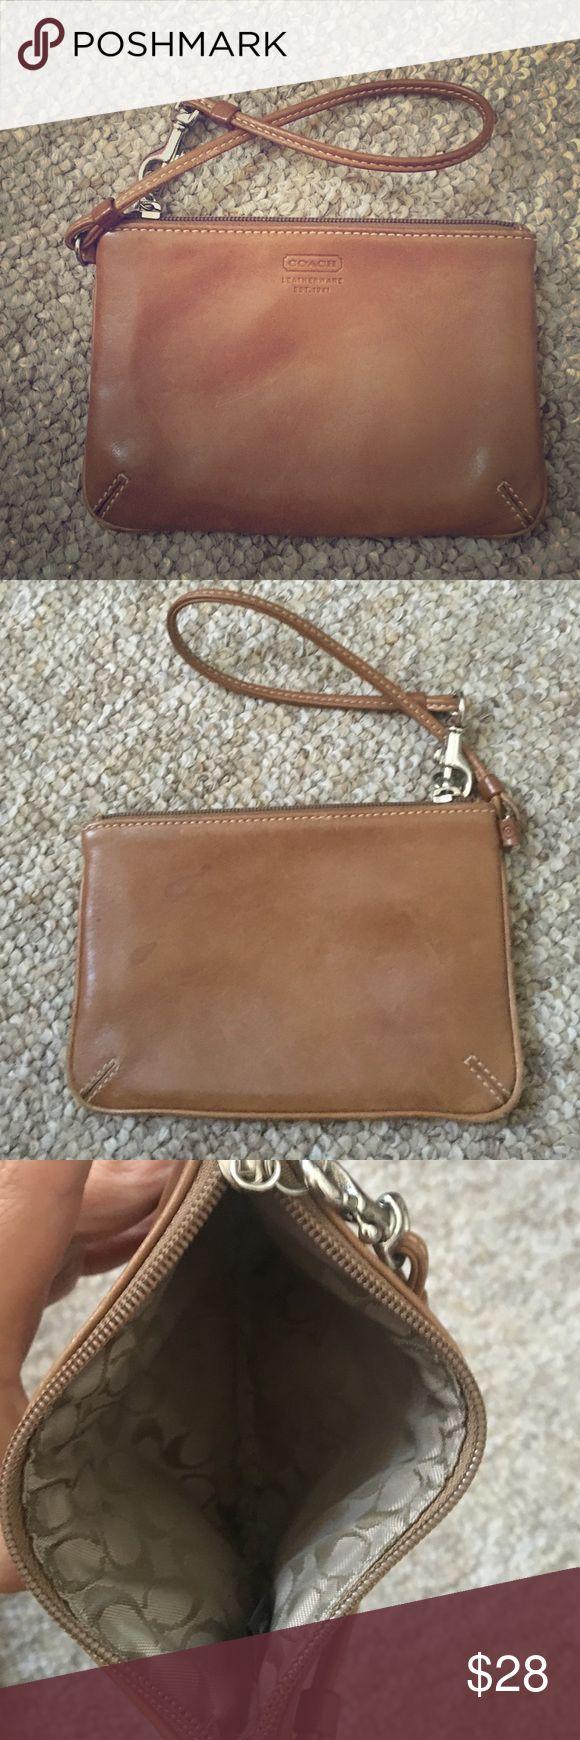 Coach tan leather women's wristlet Soft tan leather, signature c inside liner Coach Bags Clutches & Wristlets